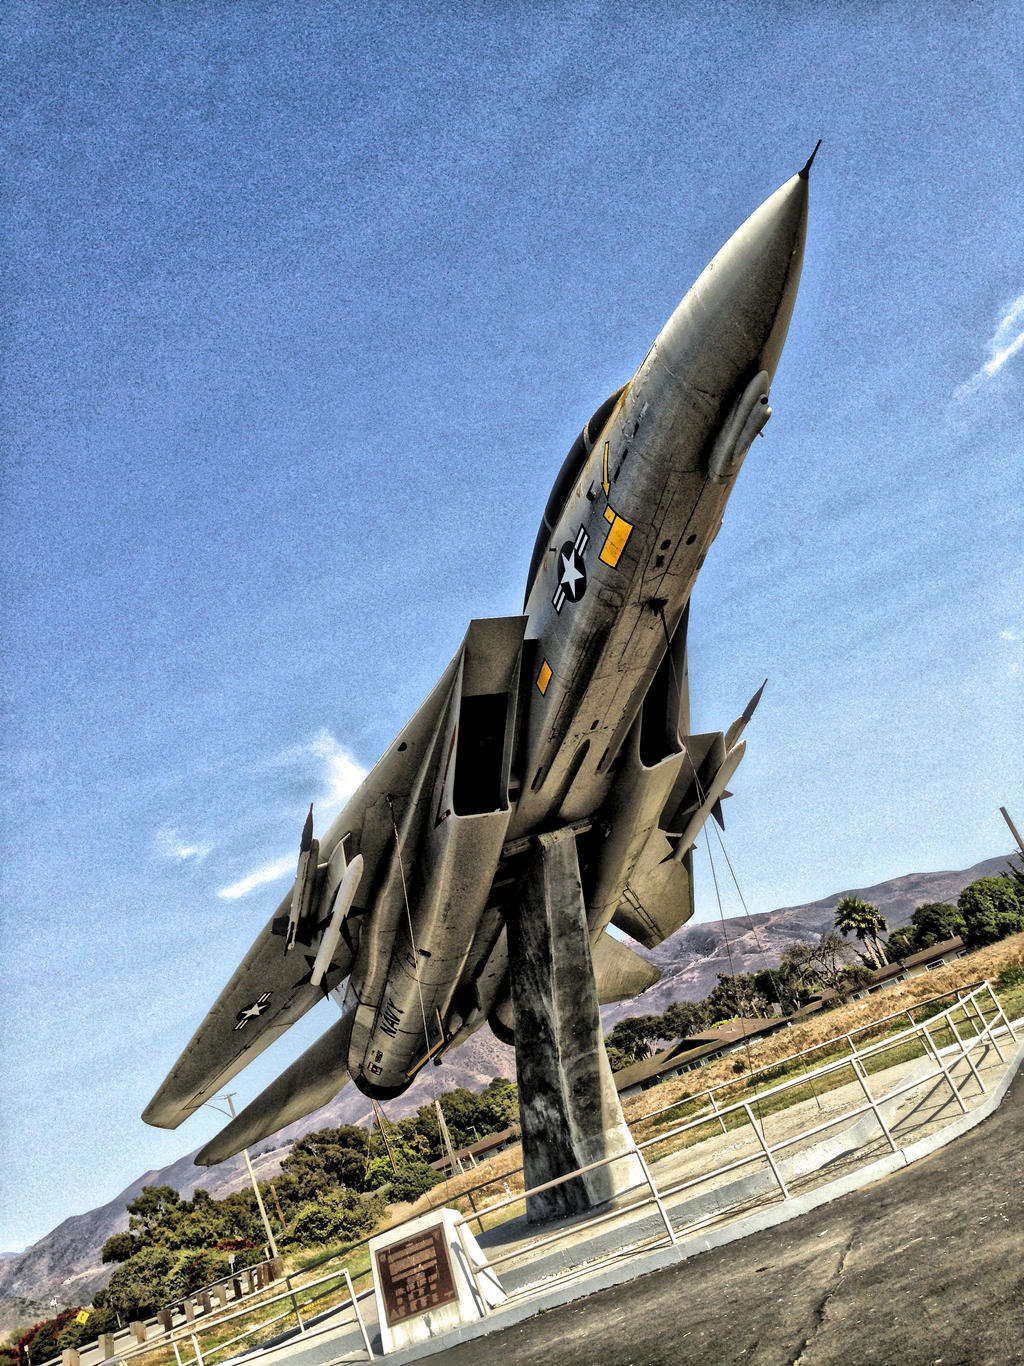 F-14 Tomcat UP by AthenaIce